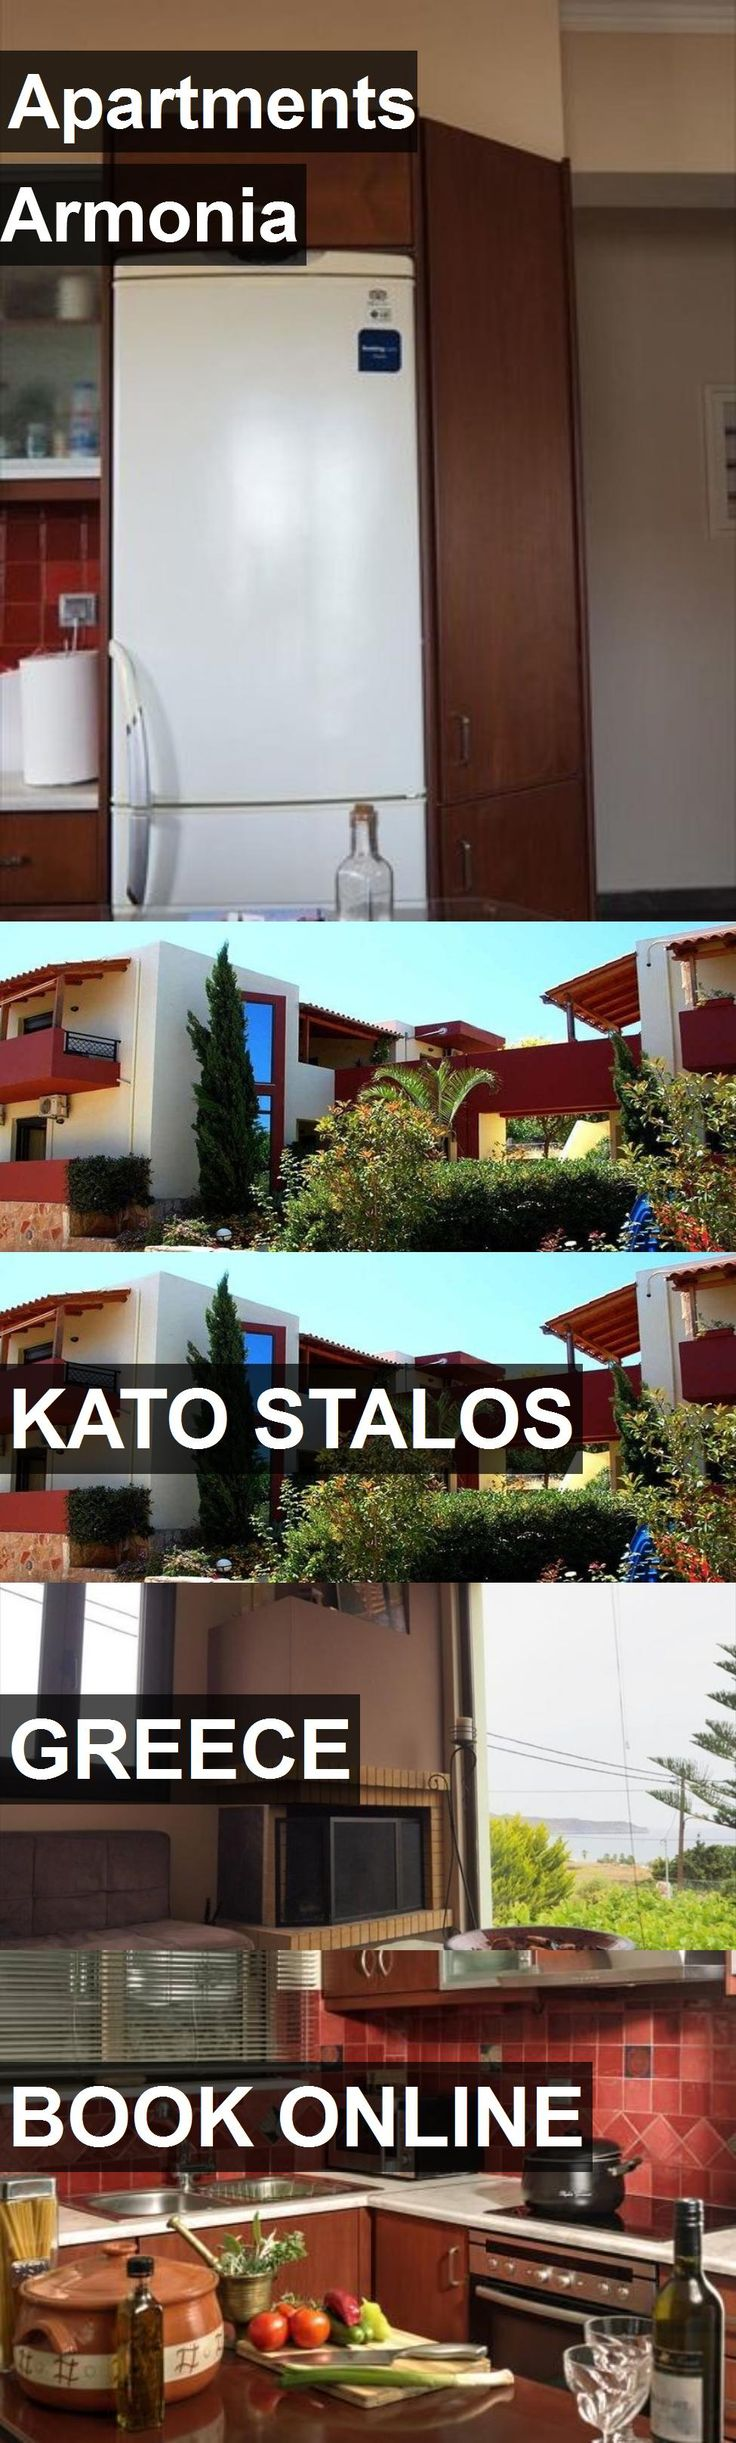 Apartments Armonia in Kato Stalos, Greece. For more information, photos, reviews and best prices please follow the link. #Greece #KatoStalos #travel #vacation #apartment